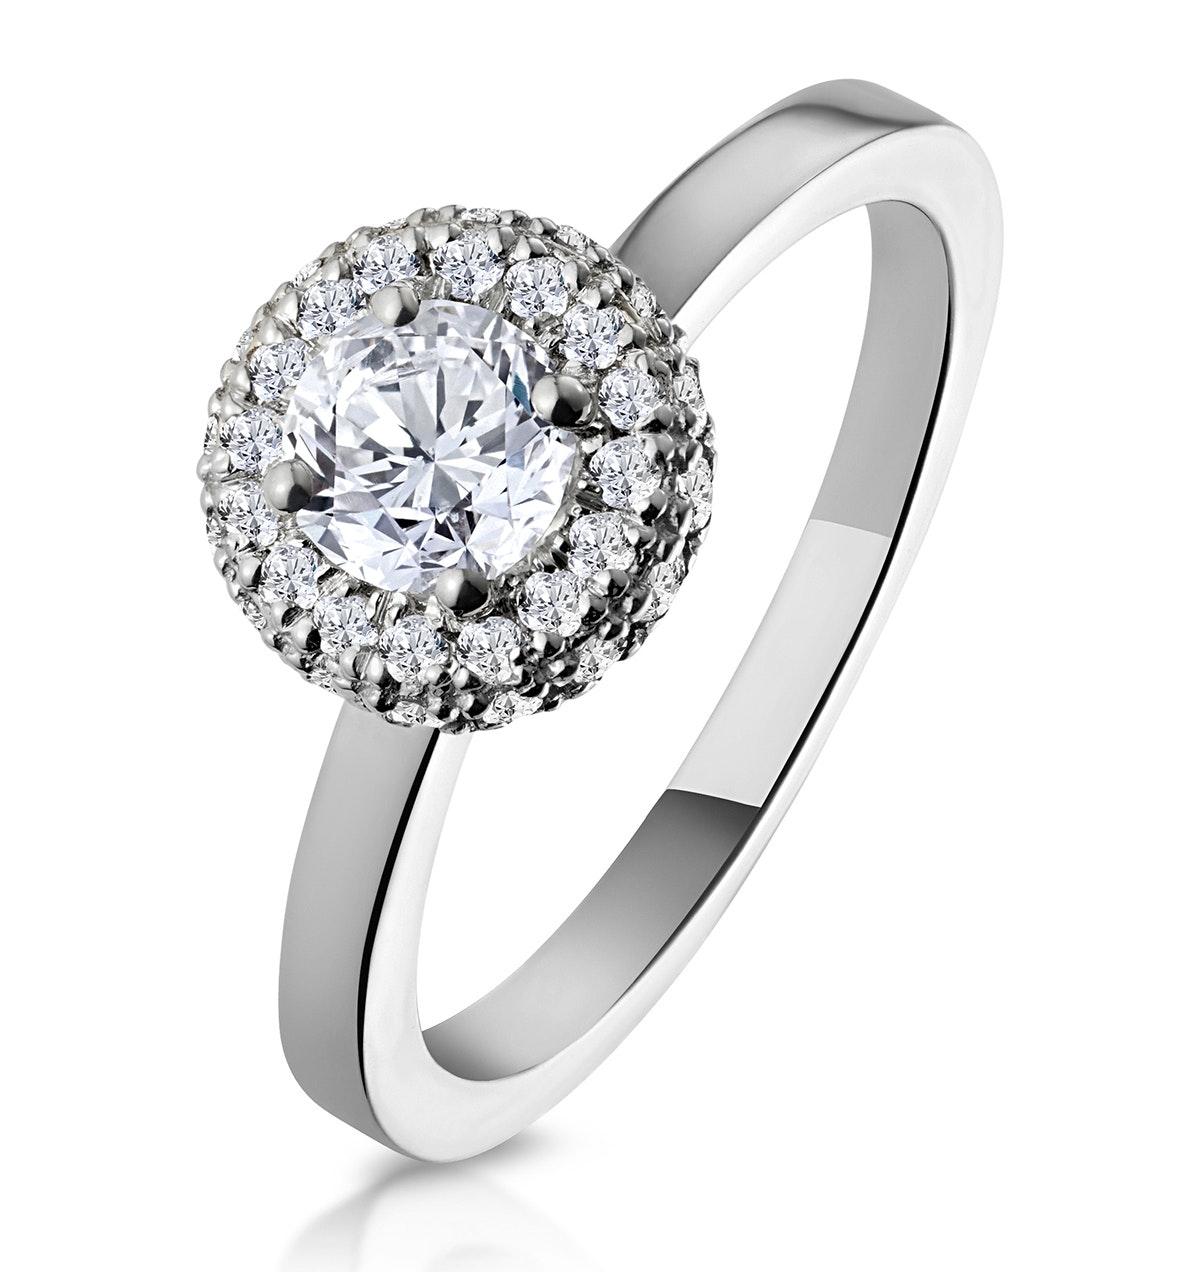 Eleanor GIA Diamond Halo Engagement Ring in Platinum 0.65ct G/VS1